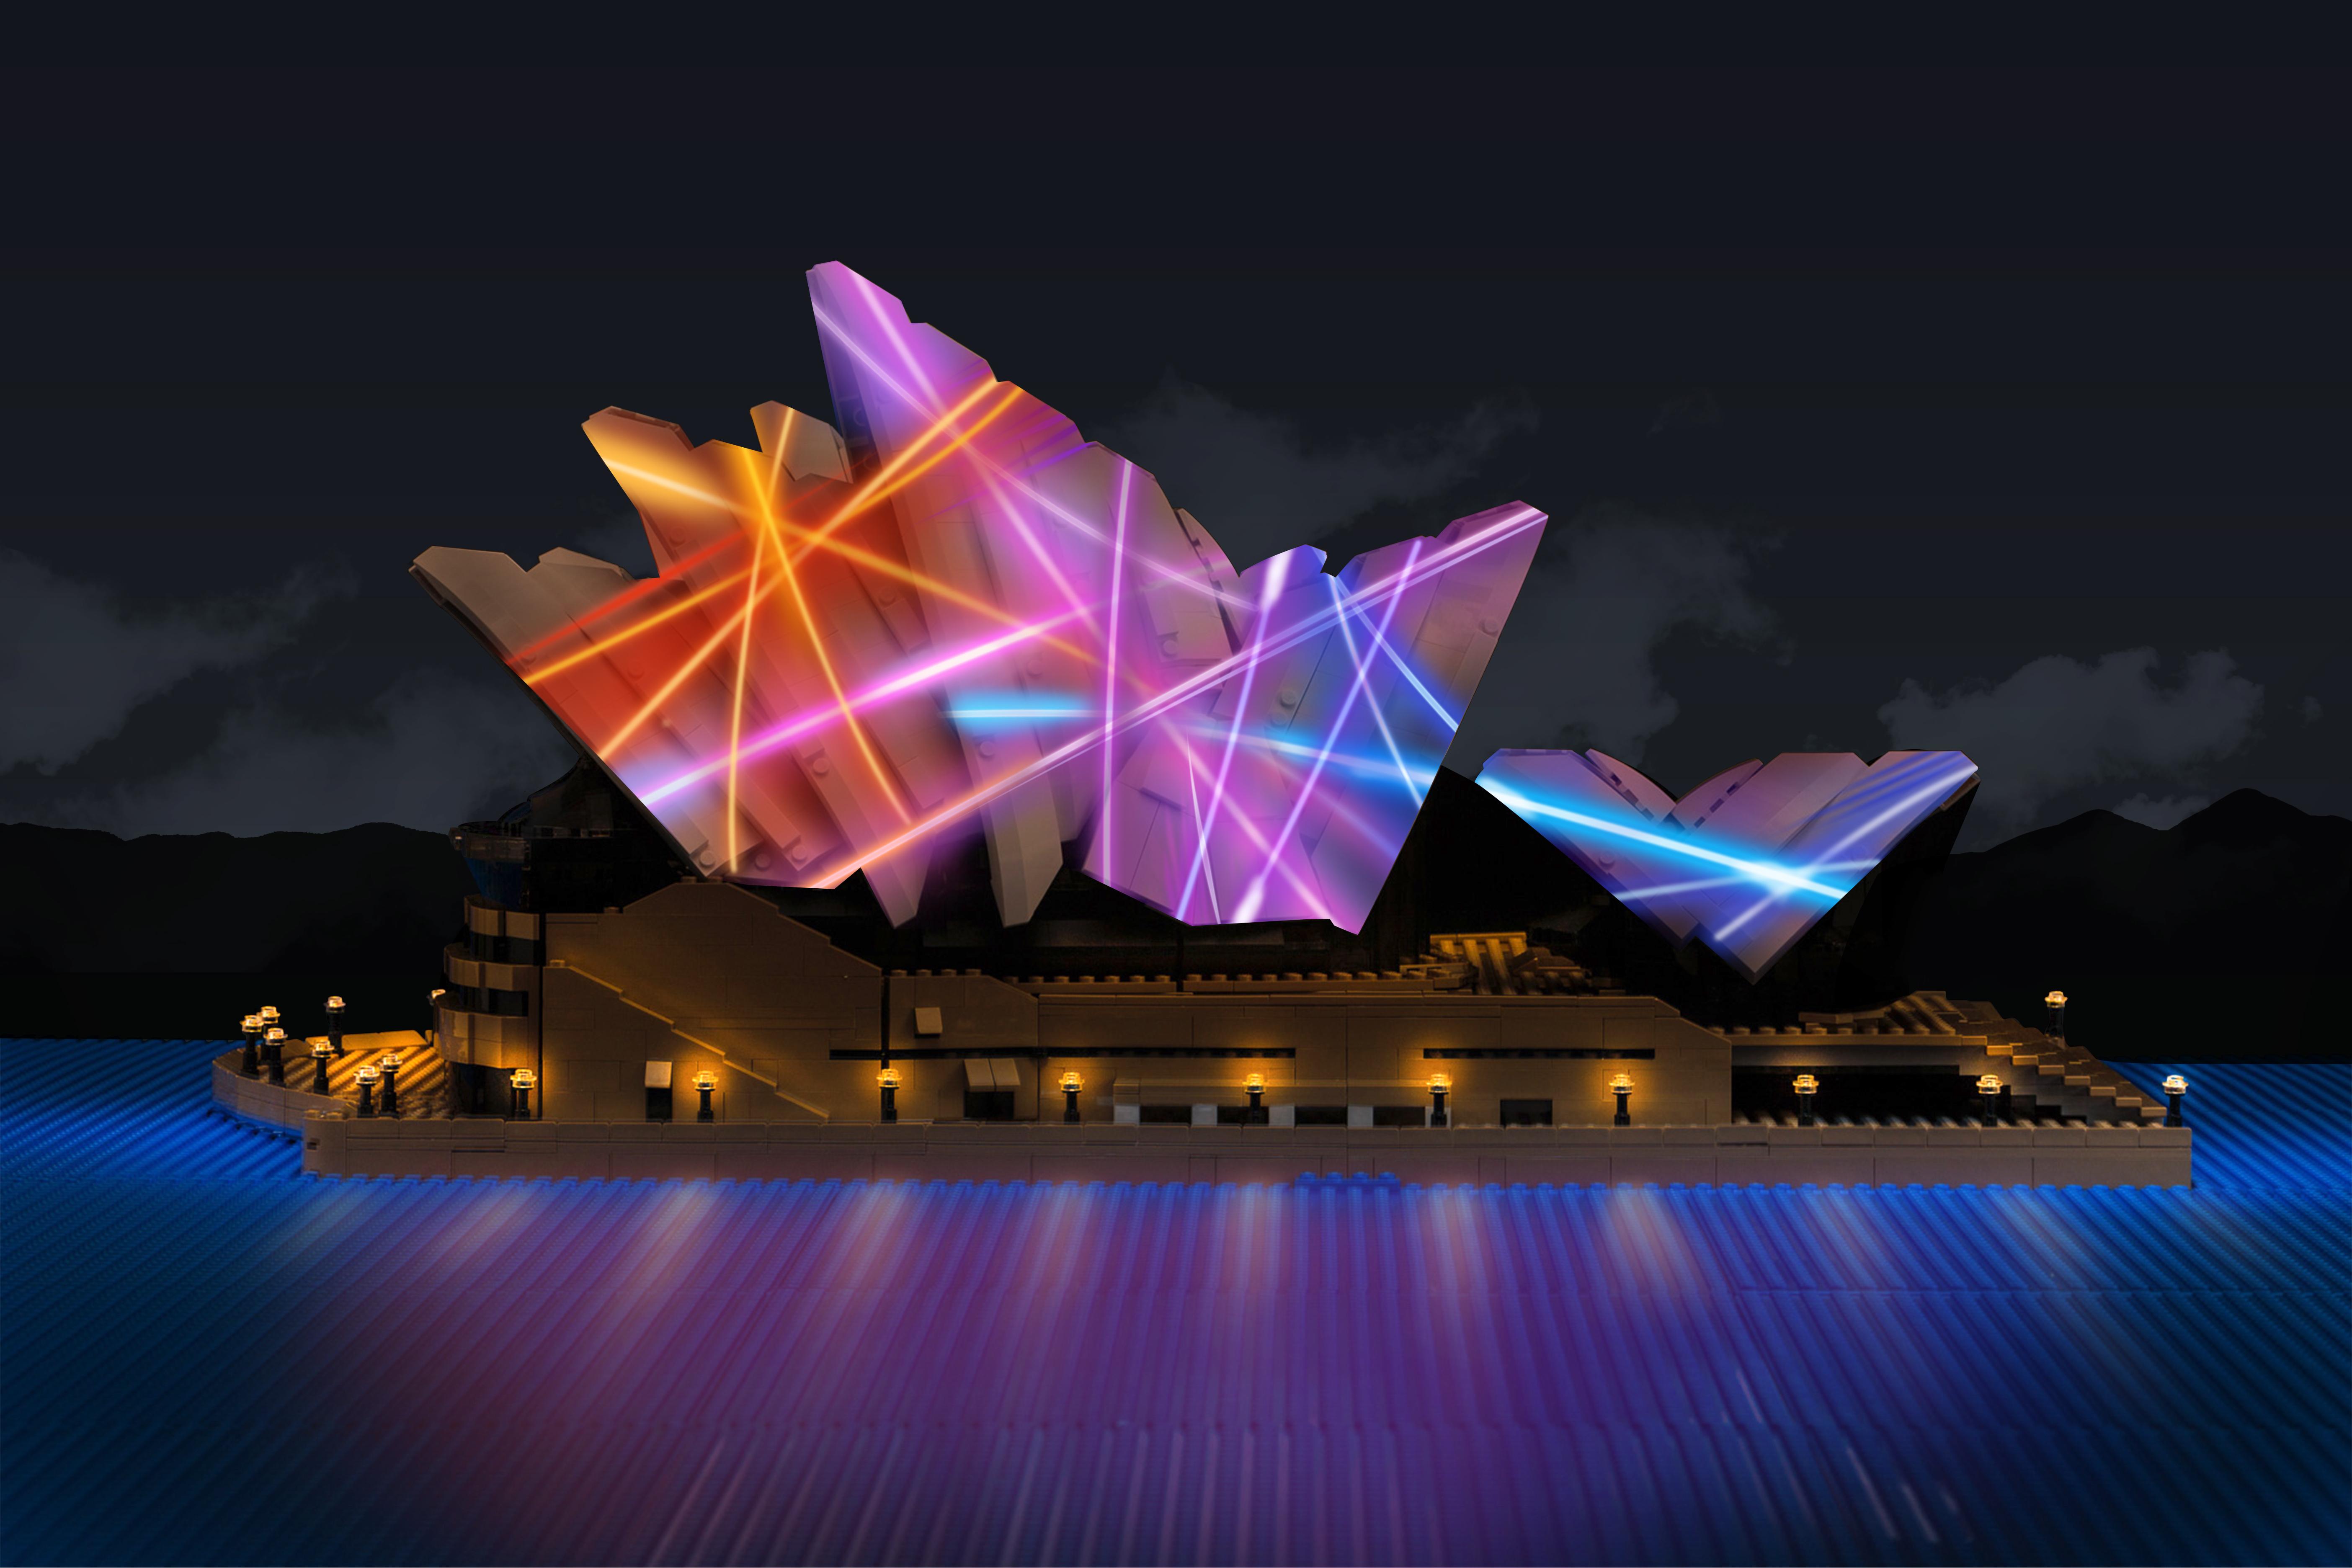 Lego Sydney Opera House Lights